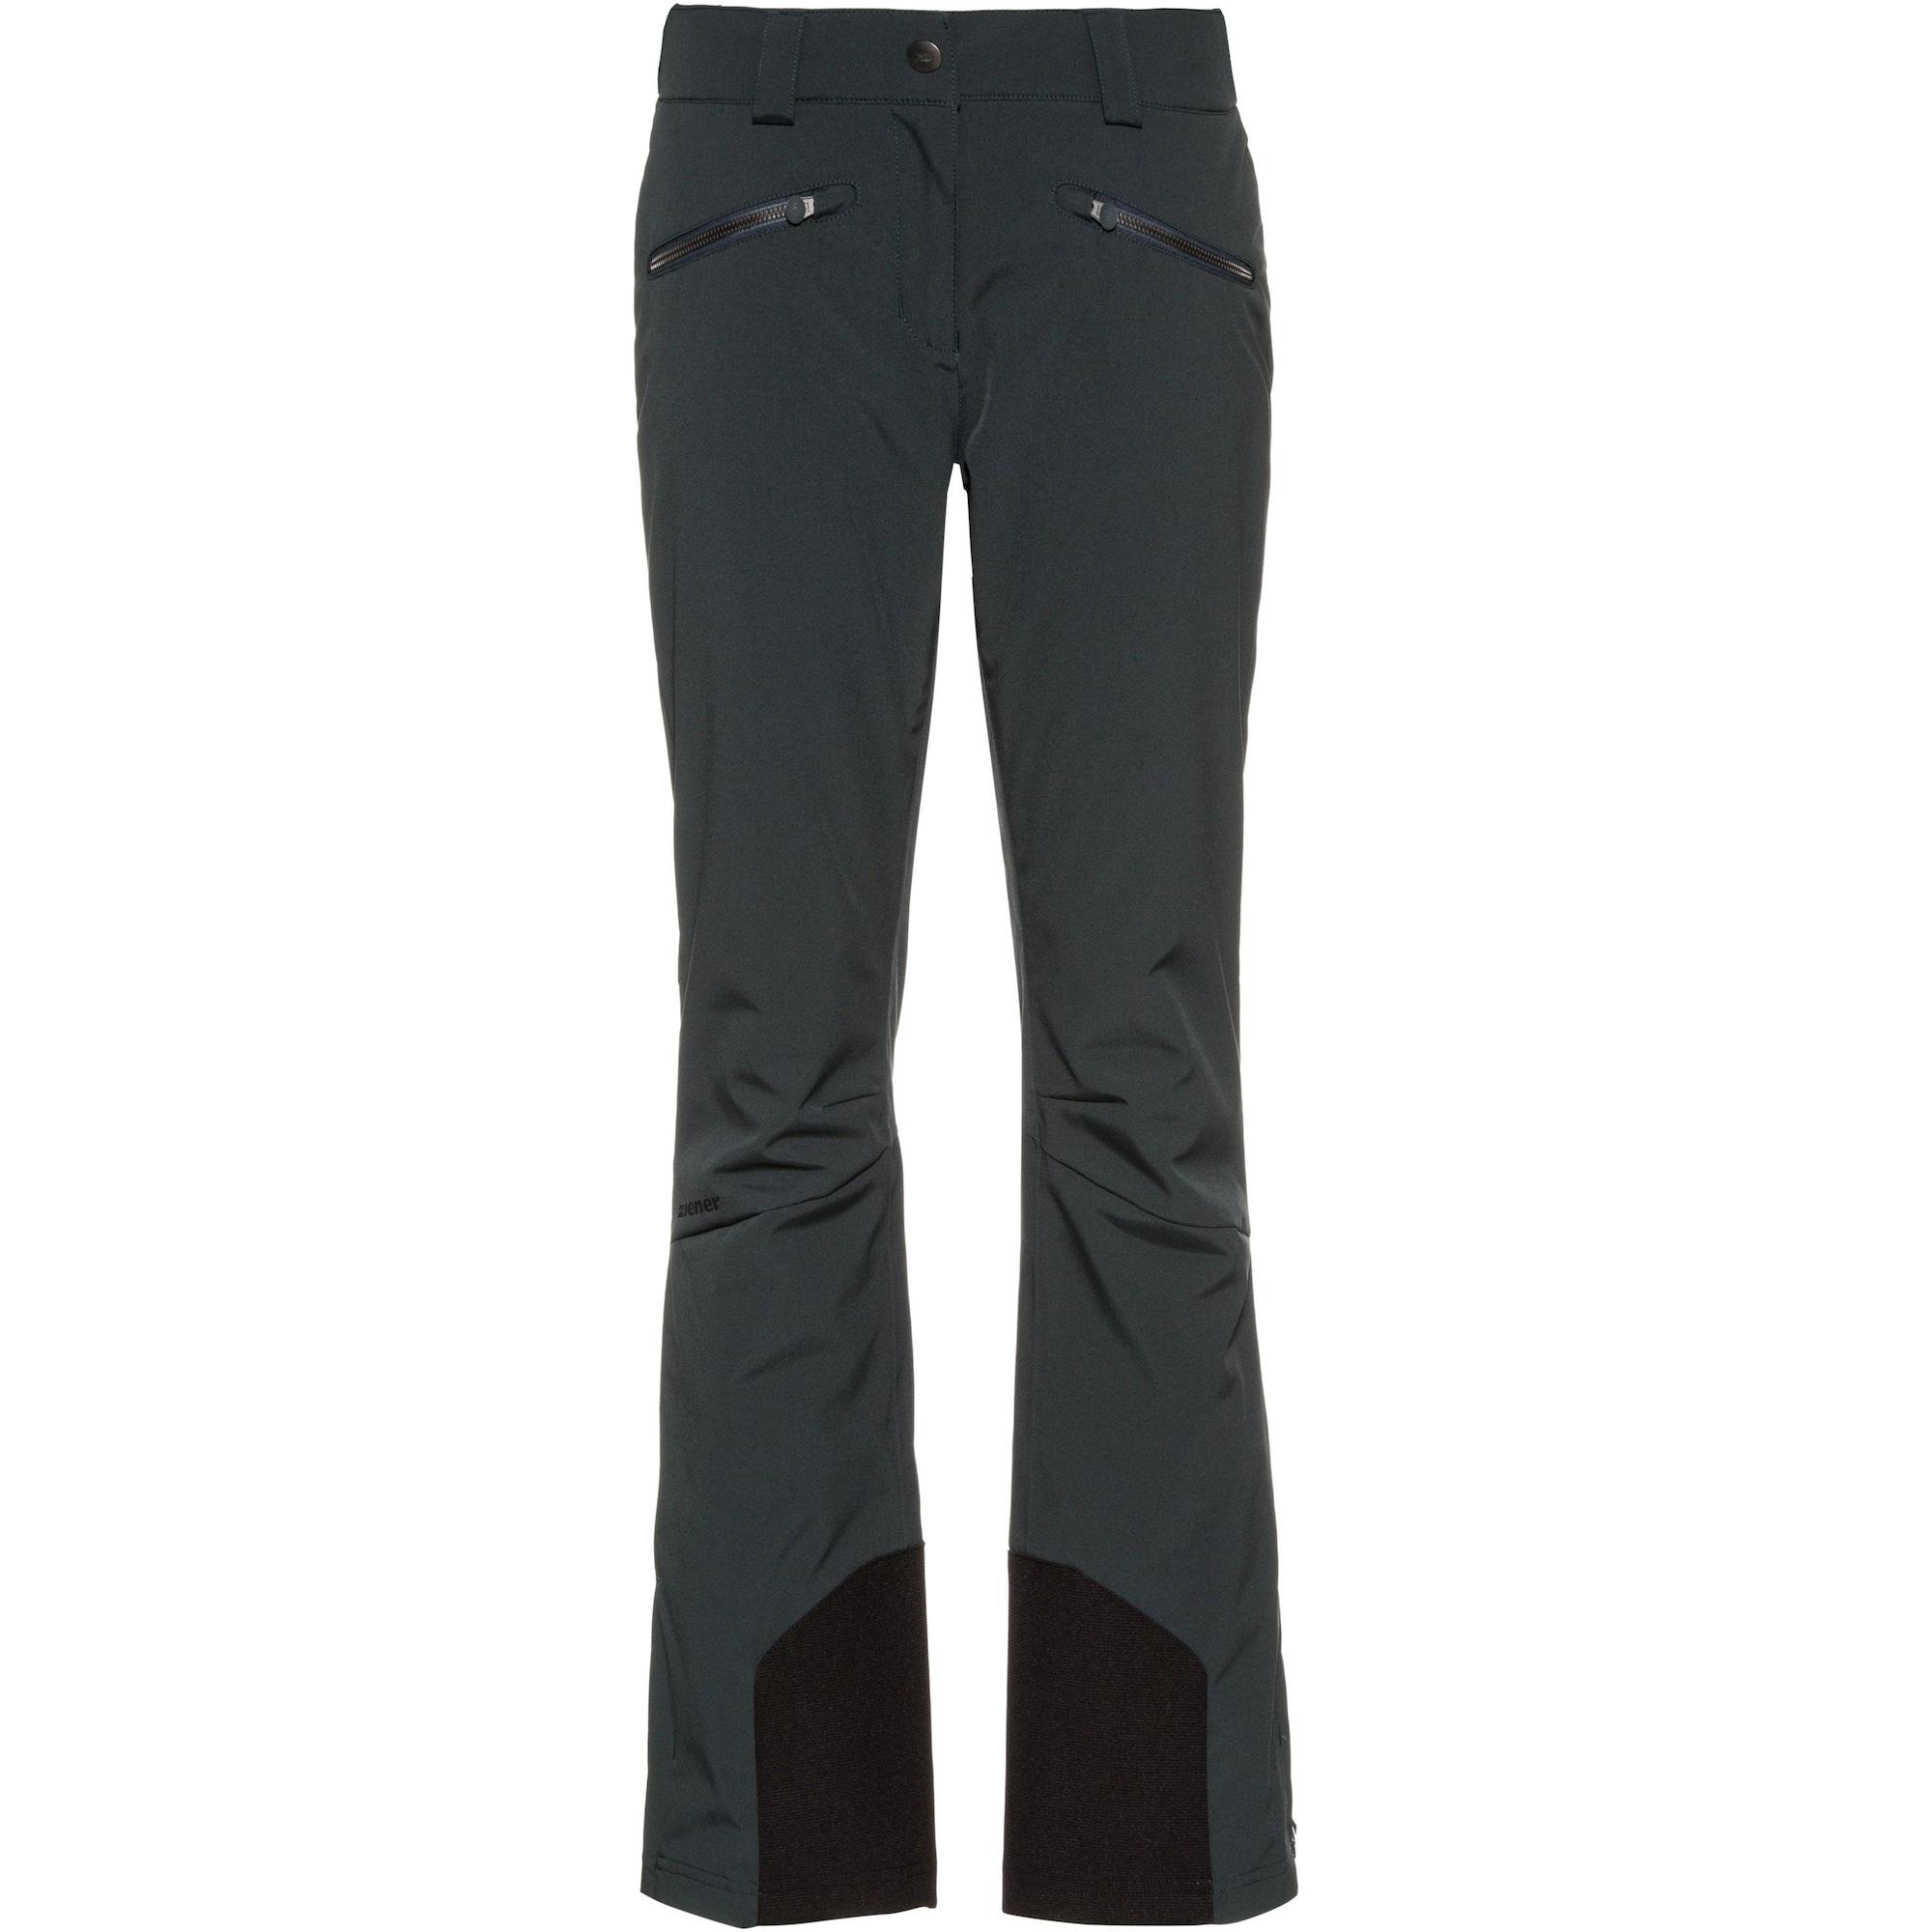 ZIENER Športové nohavice 'Taire'  čierna